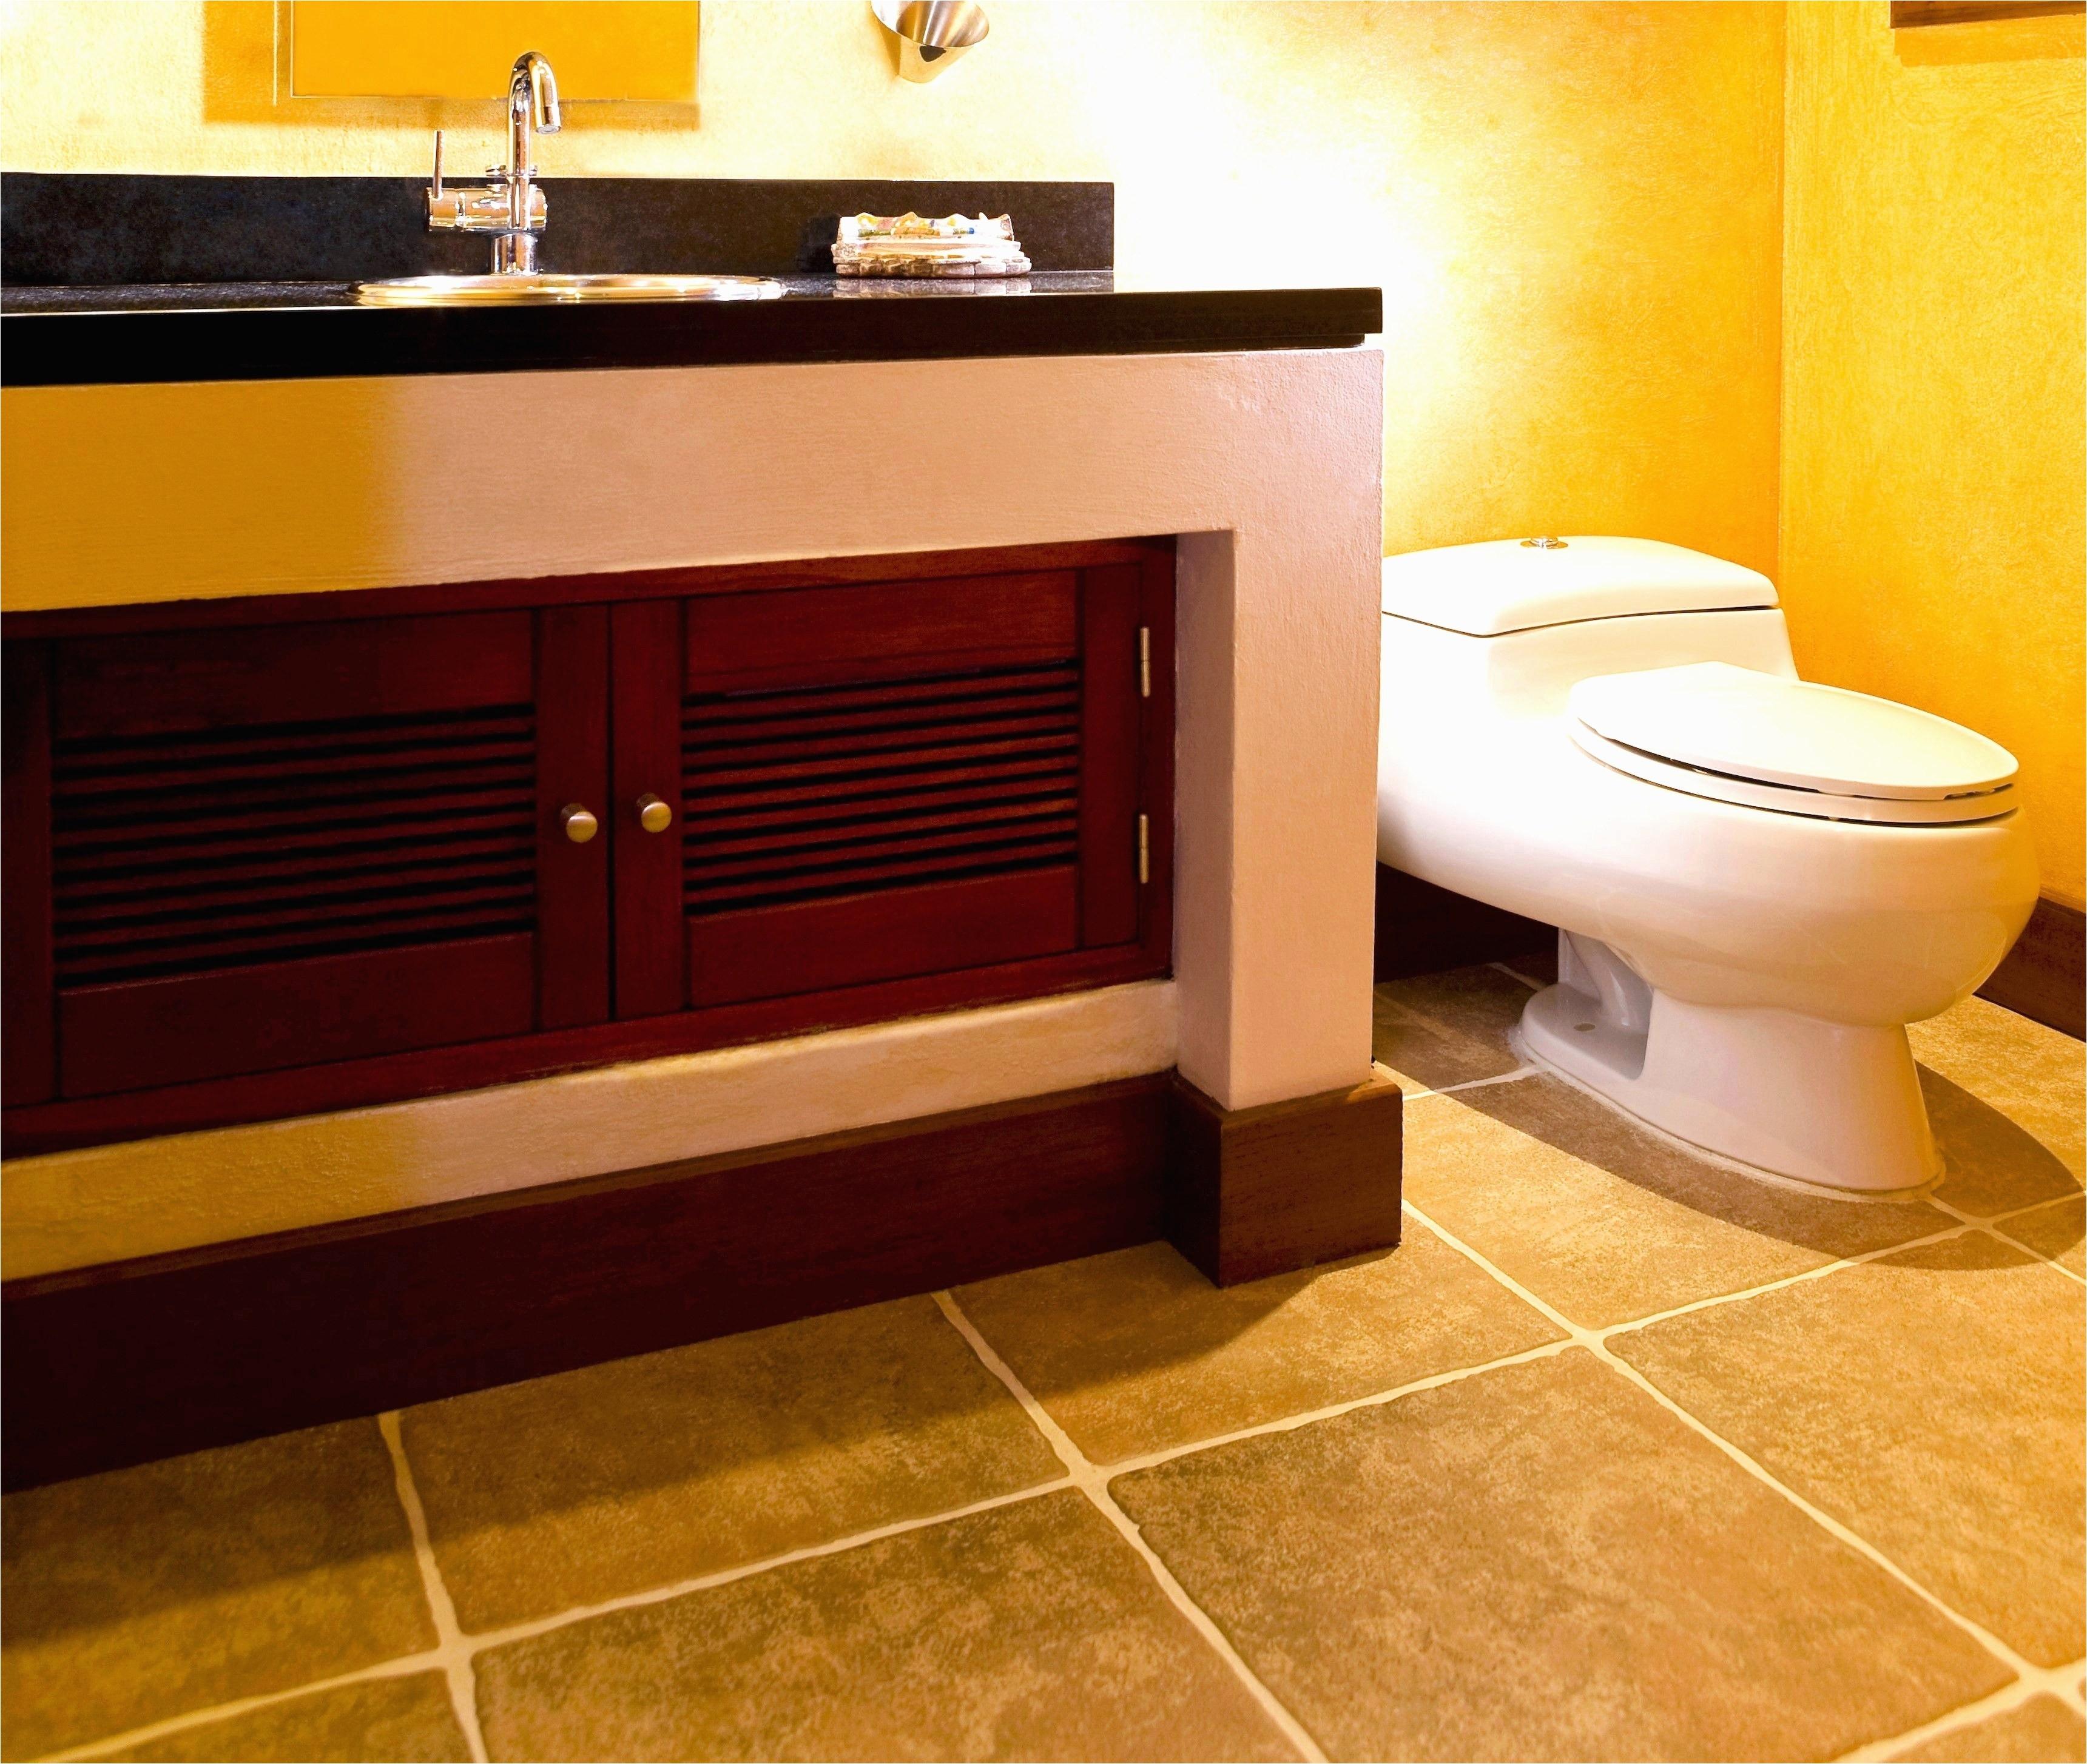 Bathroom Tile Design Ideas Black Very Best Home Decor Tile Best Floor Tiles Mosaic Bathroom 0d New